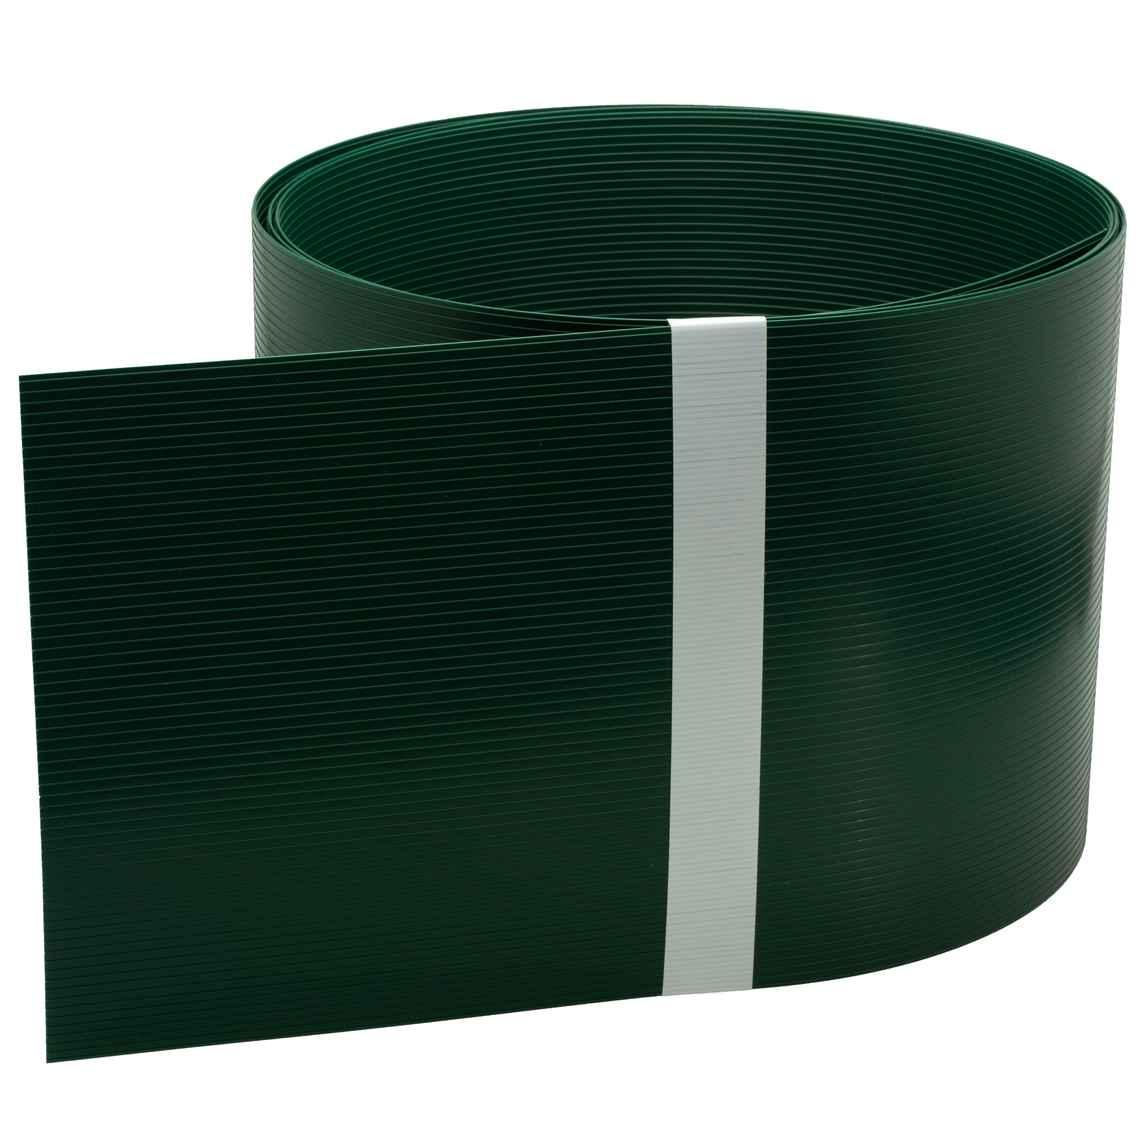 Zaun Sichtschutzstreifen Aus Hart Pvc Grun 252x19 Cm Fur